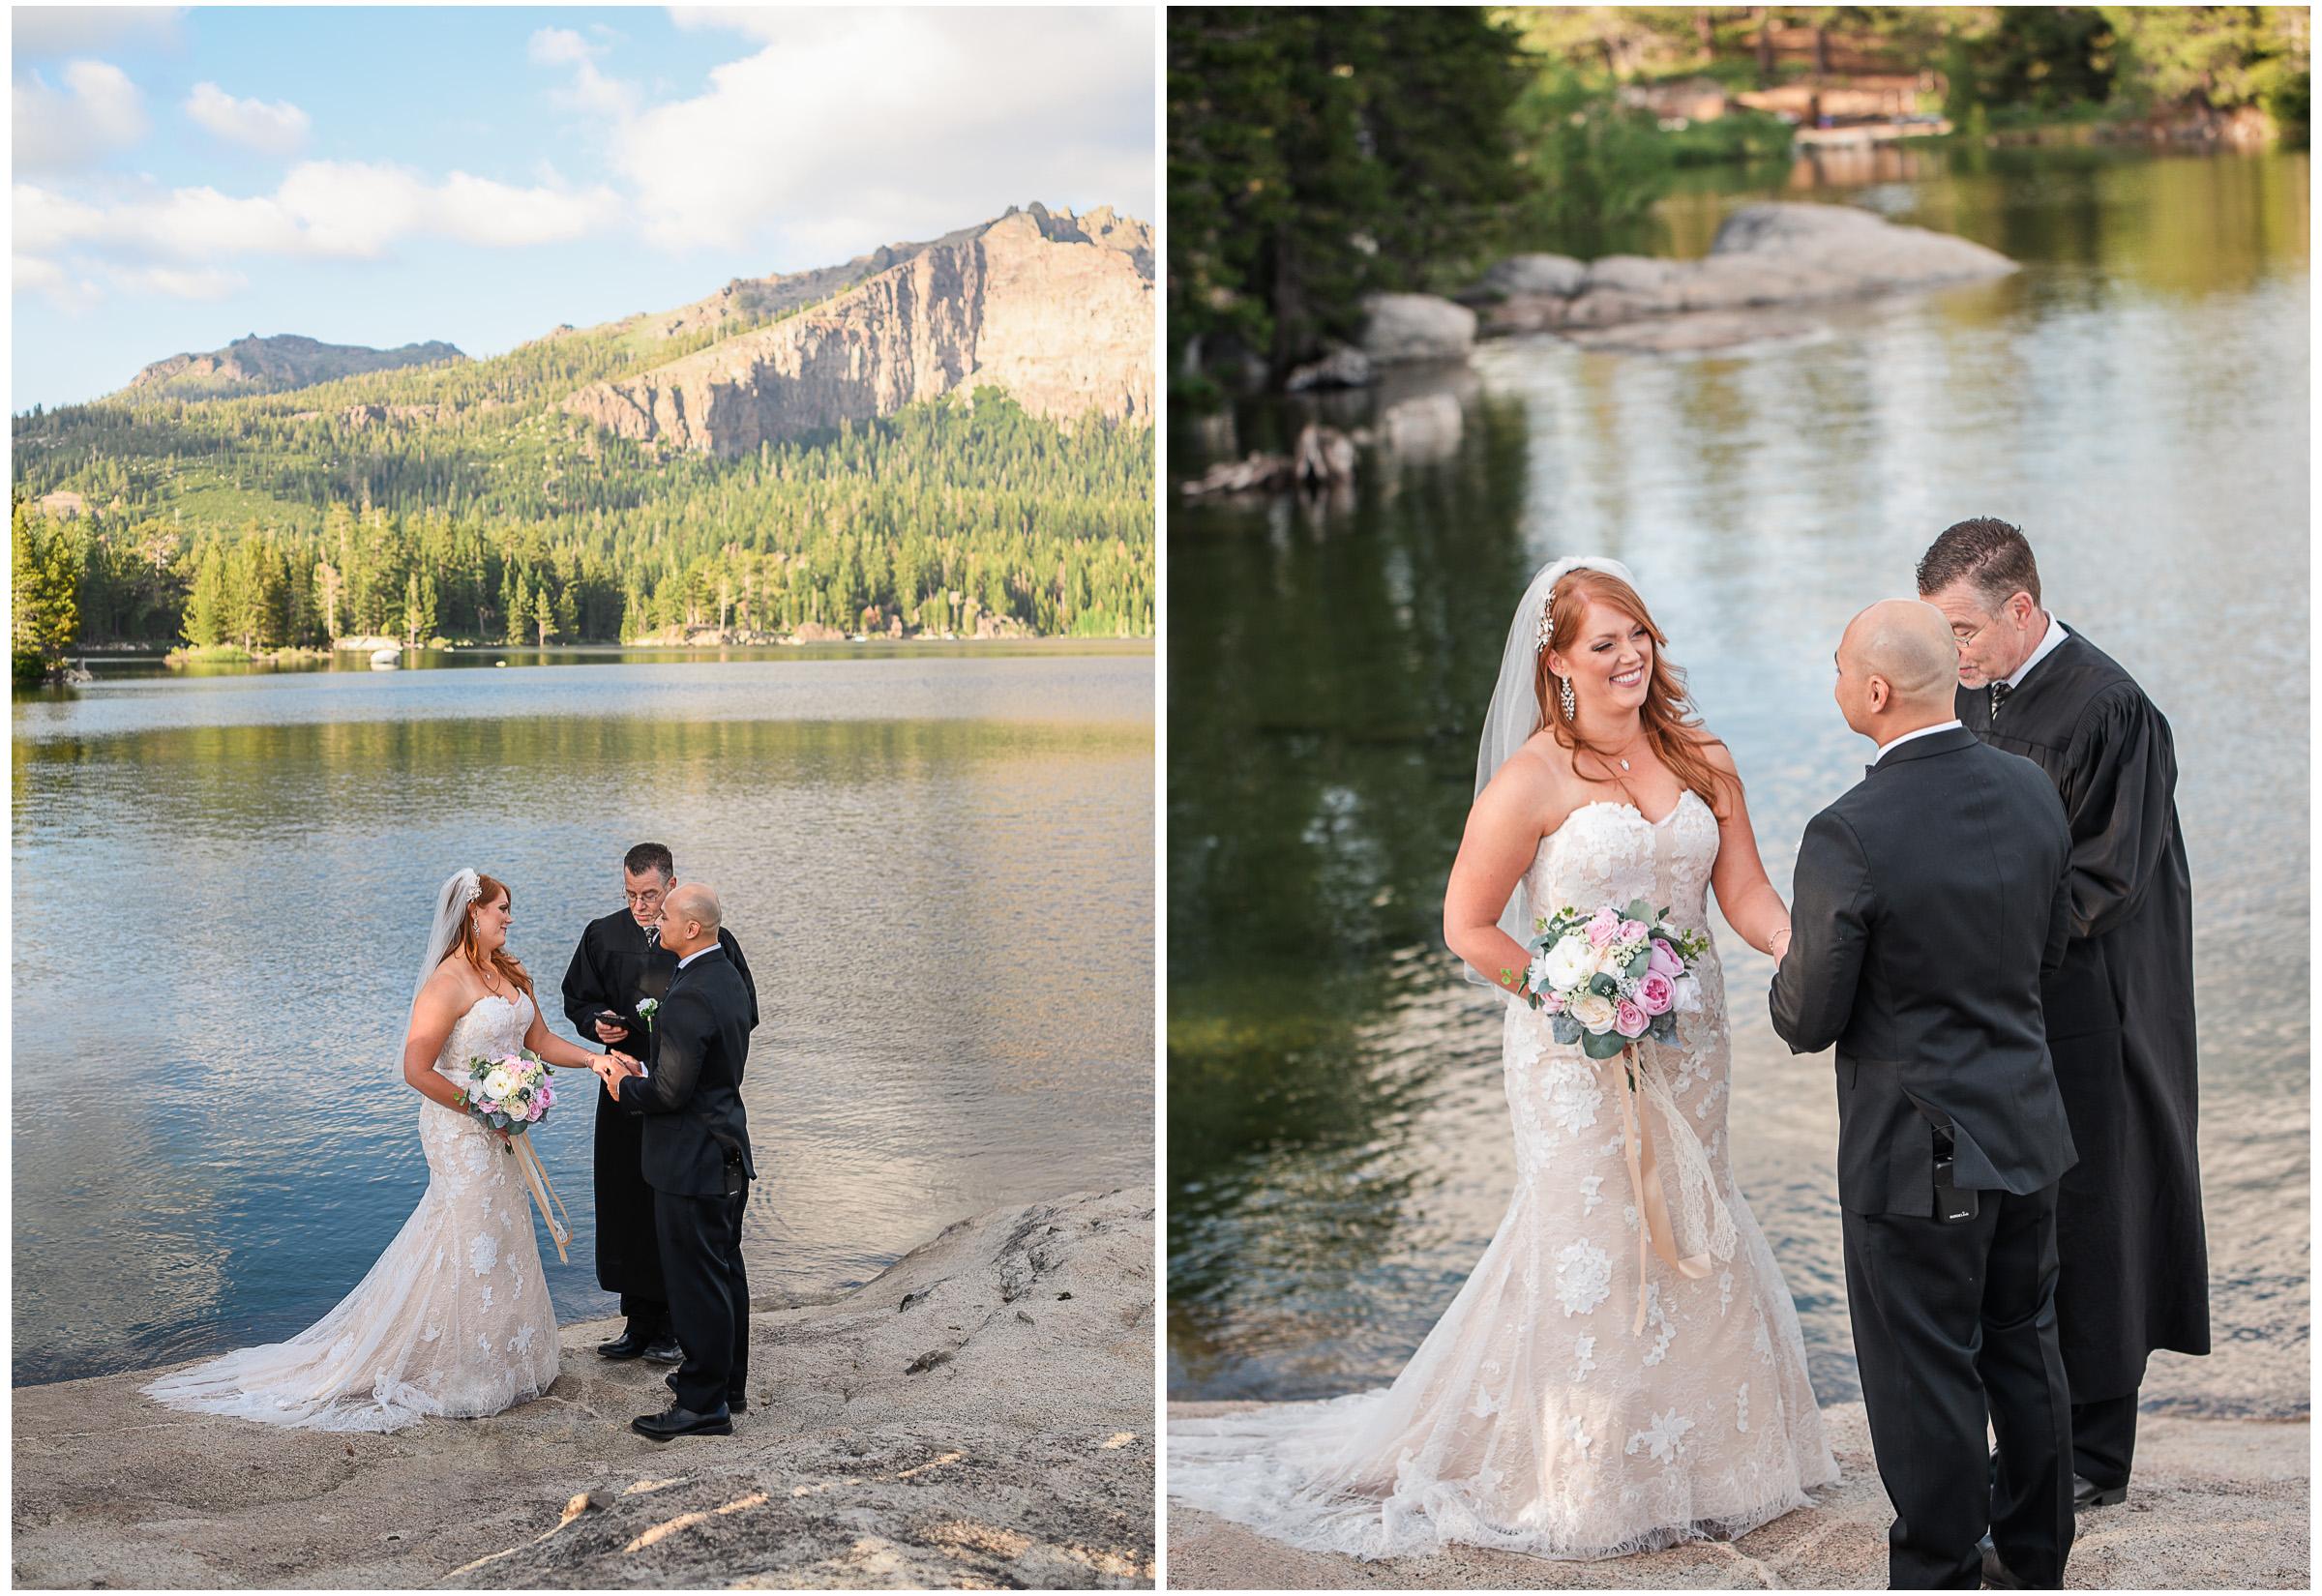 Clarksburg Wedding - Sacramento Photographer - Bogle Winery - Justin Wilcox Photography - 8.jpg